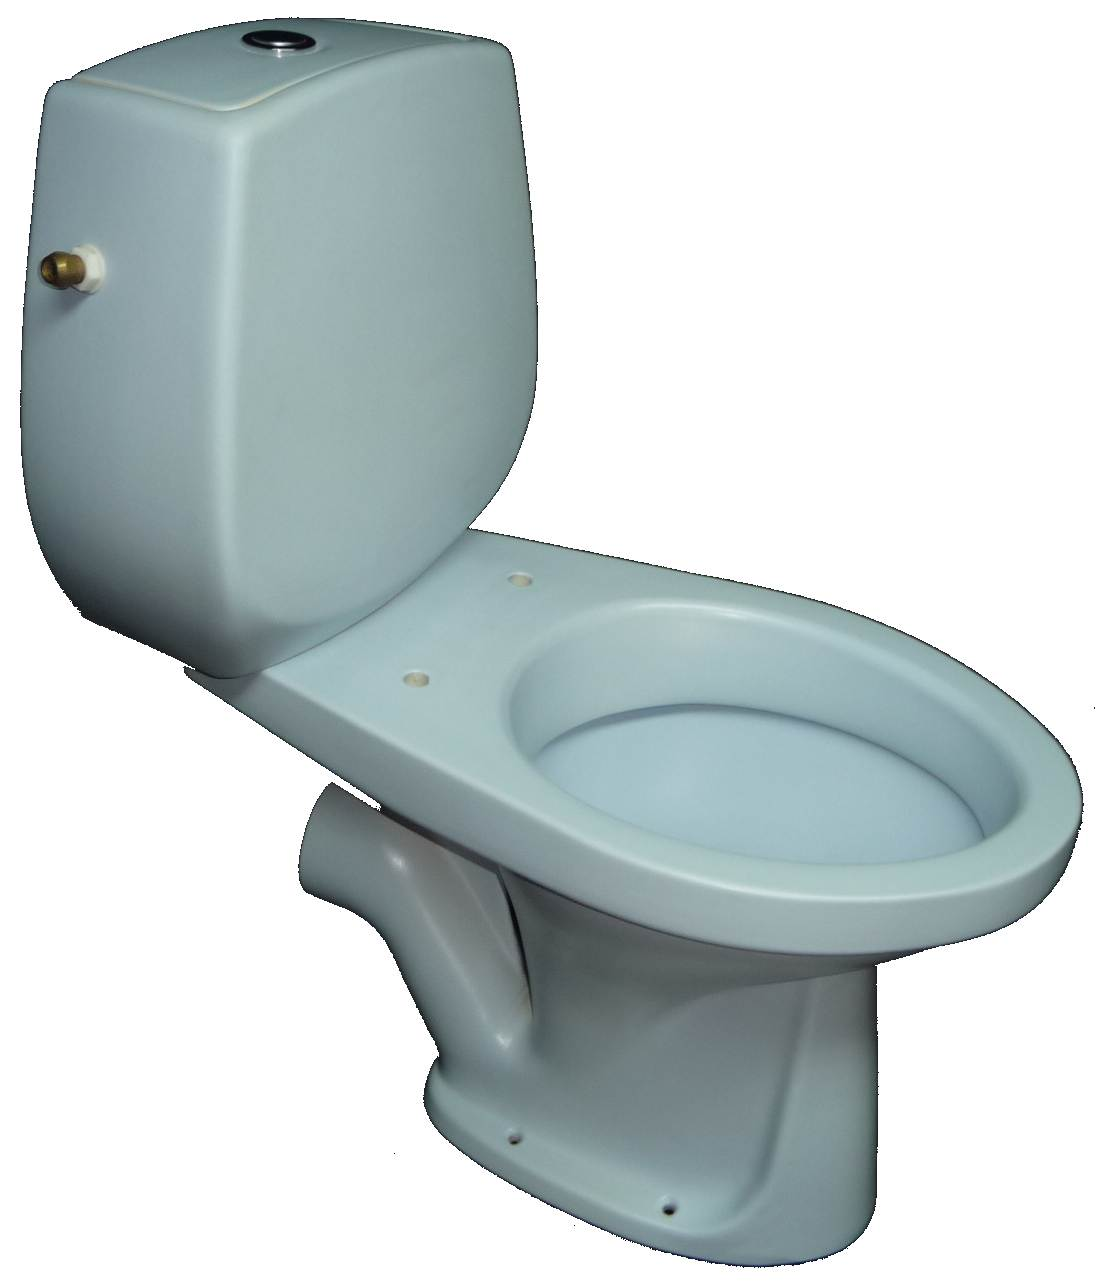 crocus Stand-WC-Kombination Warneton 444 2709 Bild 1